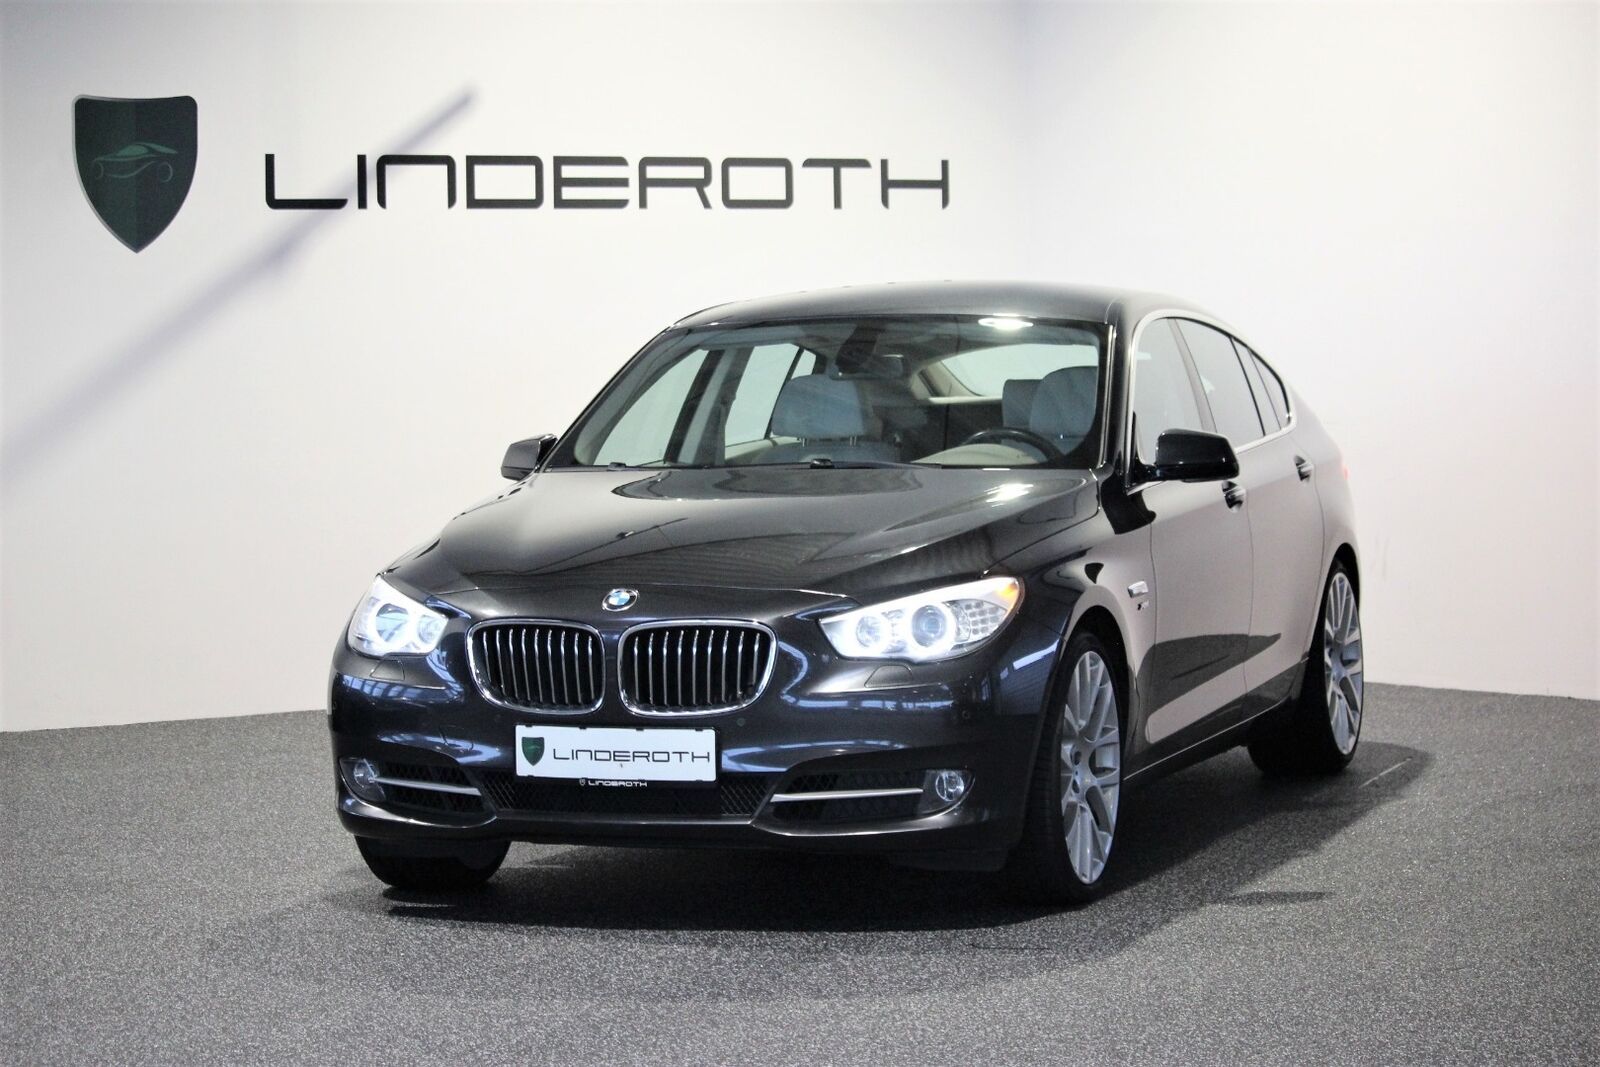 BMW 535d 3,0 Gran Turismo xDrive aut. 5d - 329.500 kr.